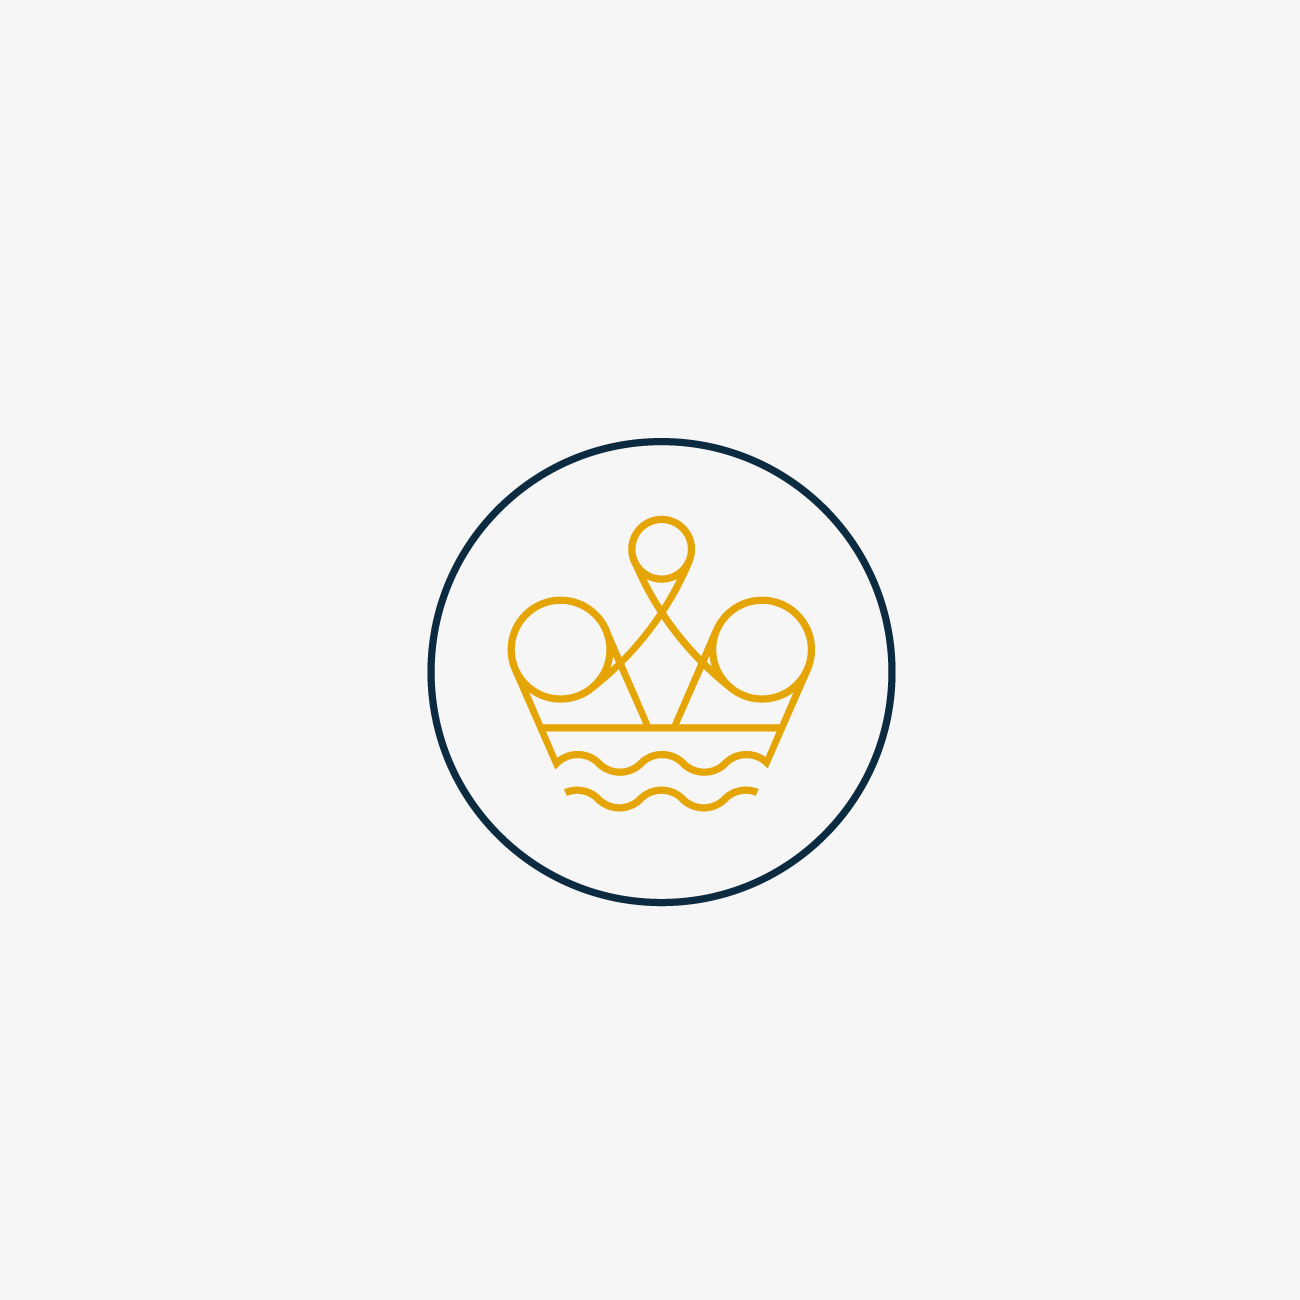 https://www.orlandinifrancesco.com/wp/wp-content/uploads/2019/02/Salento-Deluxe-Logo4.png